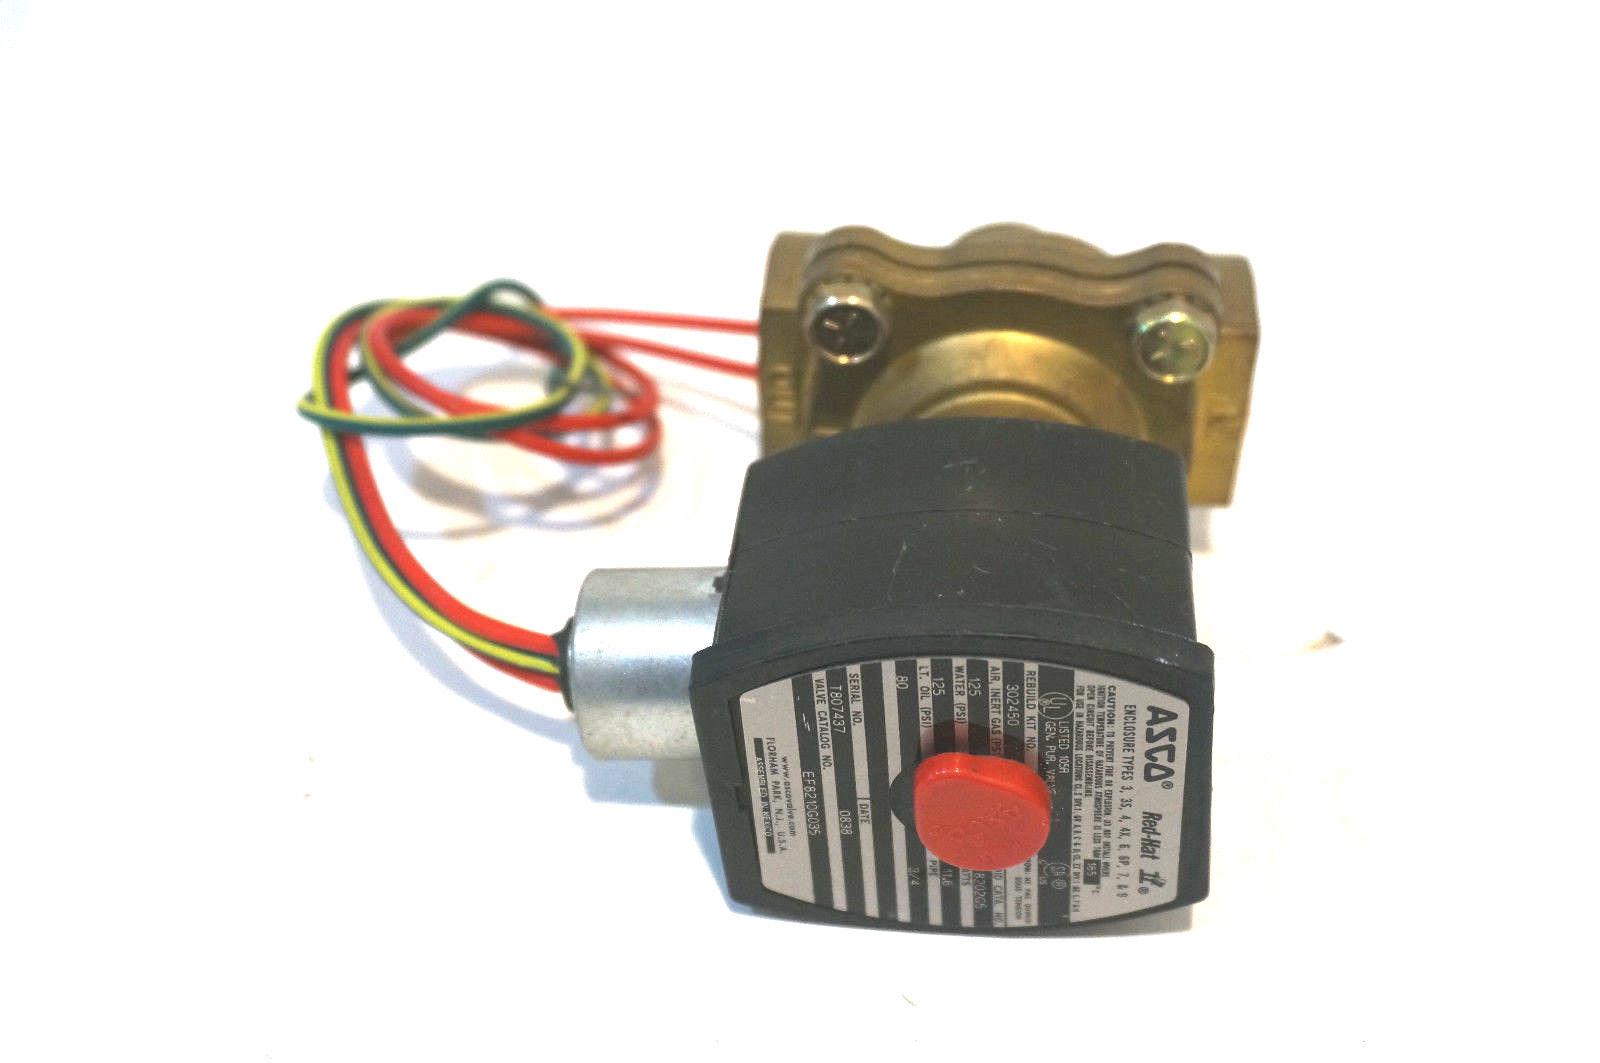 asco solenoid valve 8210 wiring diagram yamaha golf cart sb industrial supply mro plc equipment parts